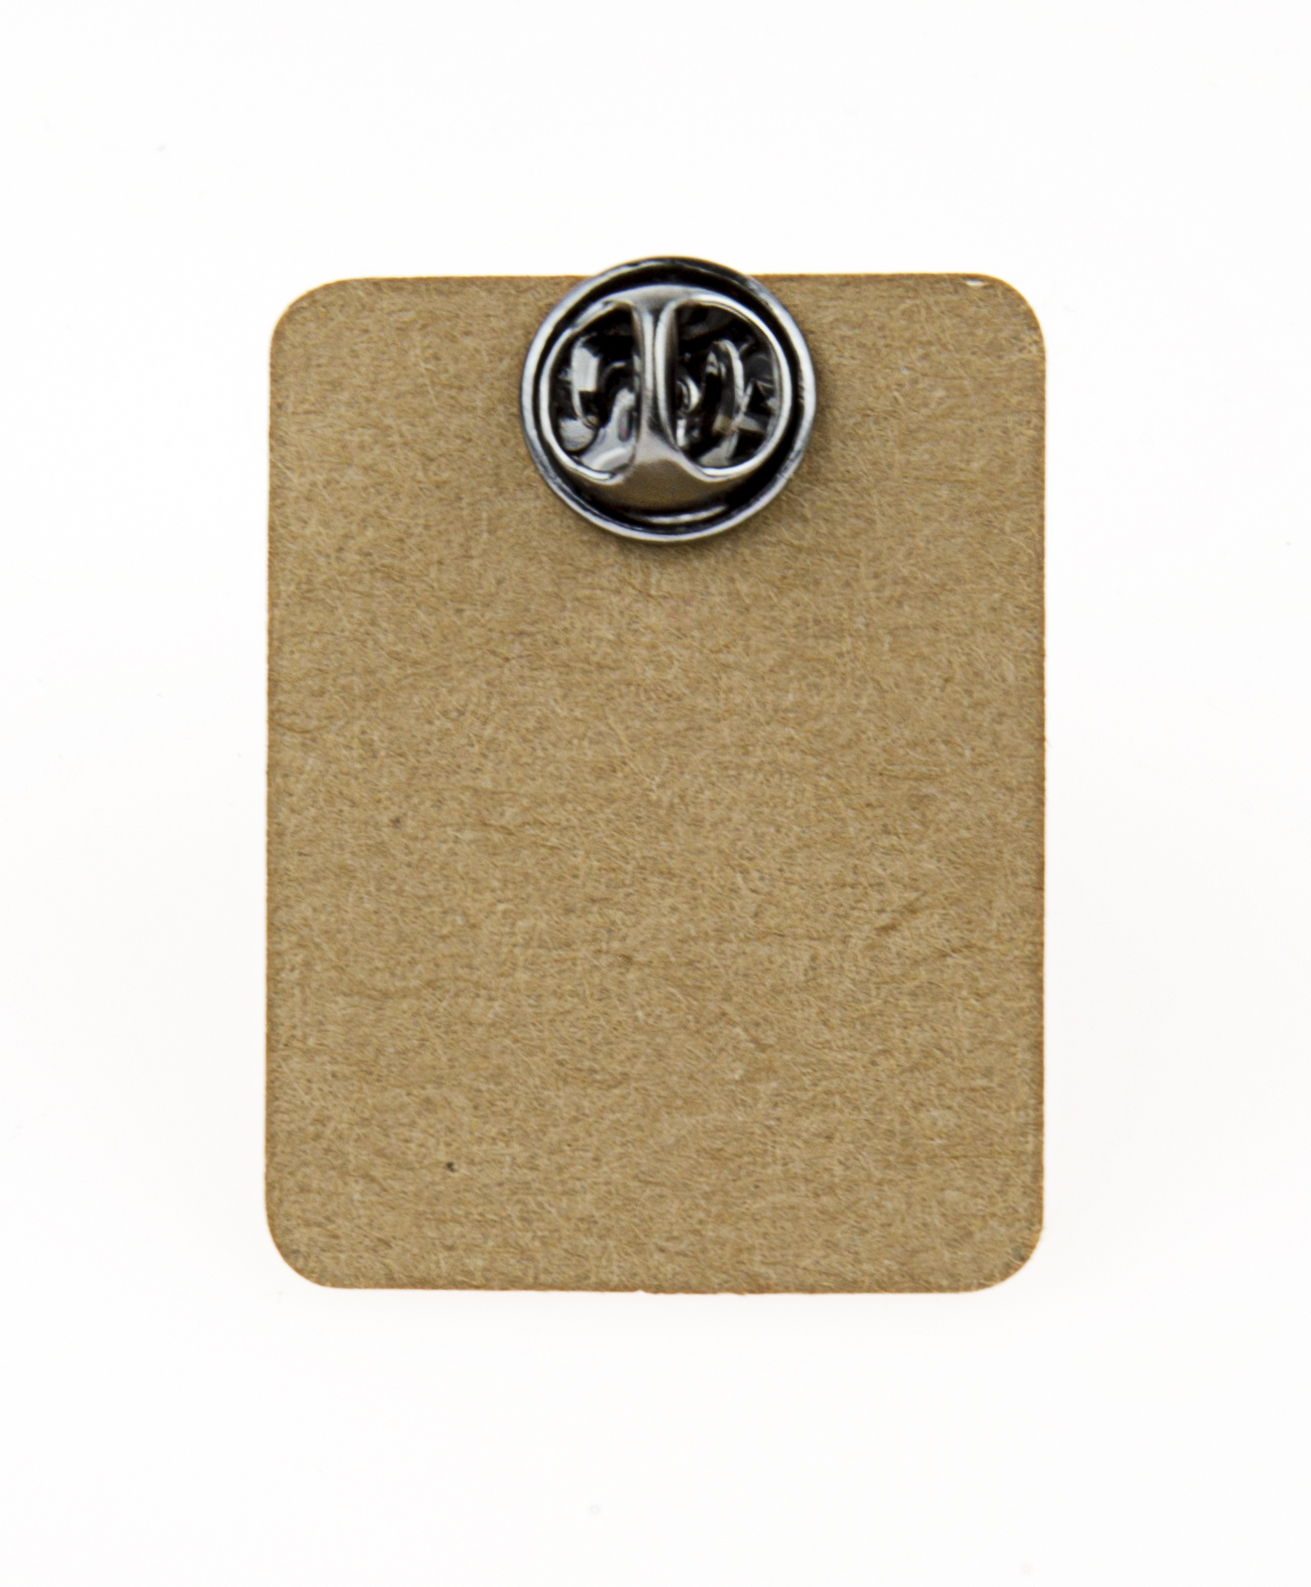 Metal Teddy Bear Heart Enamel Pin Badge